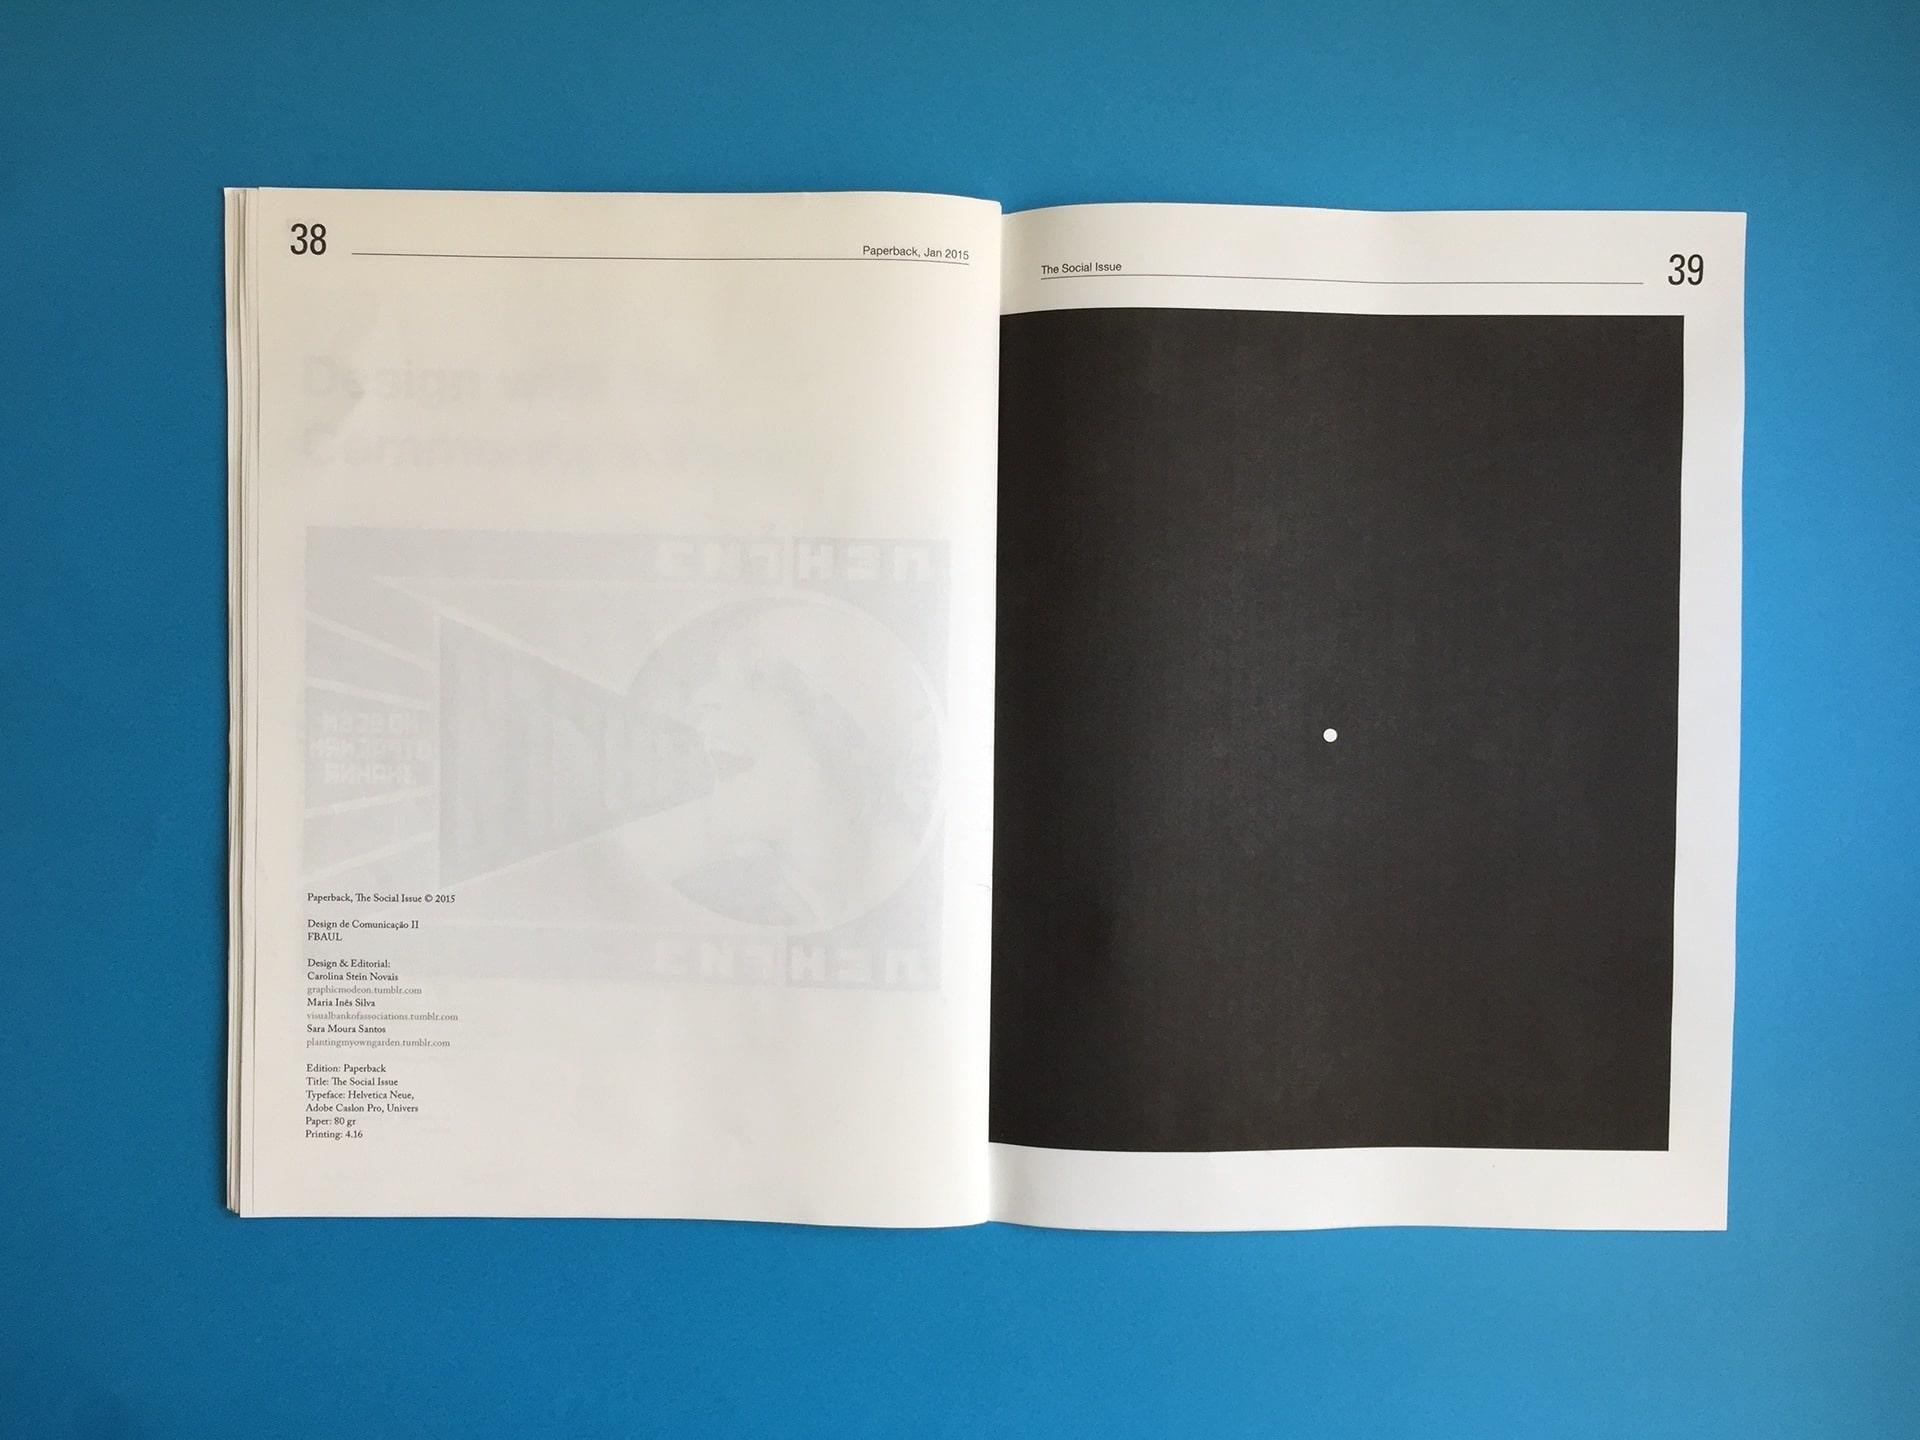 Paperback_08